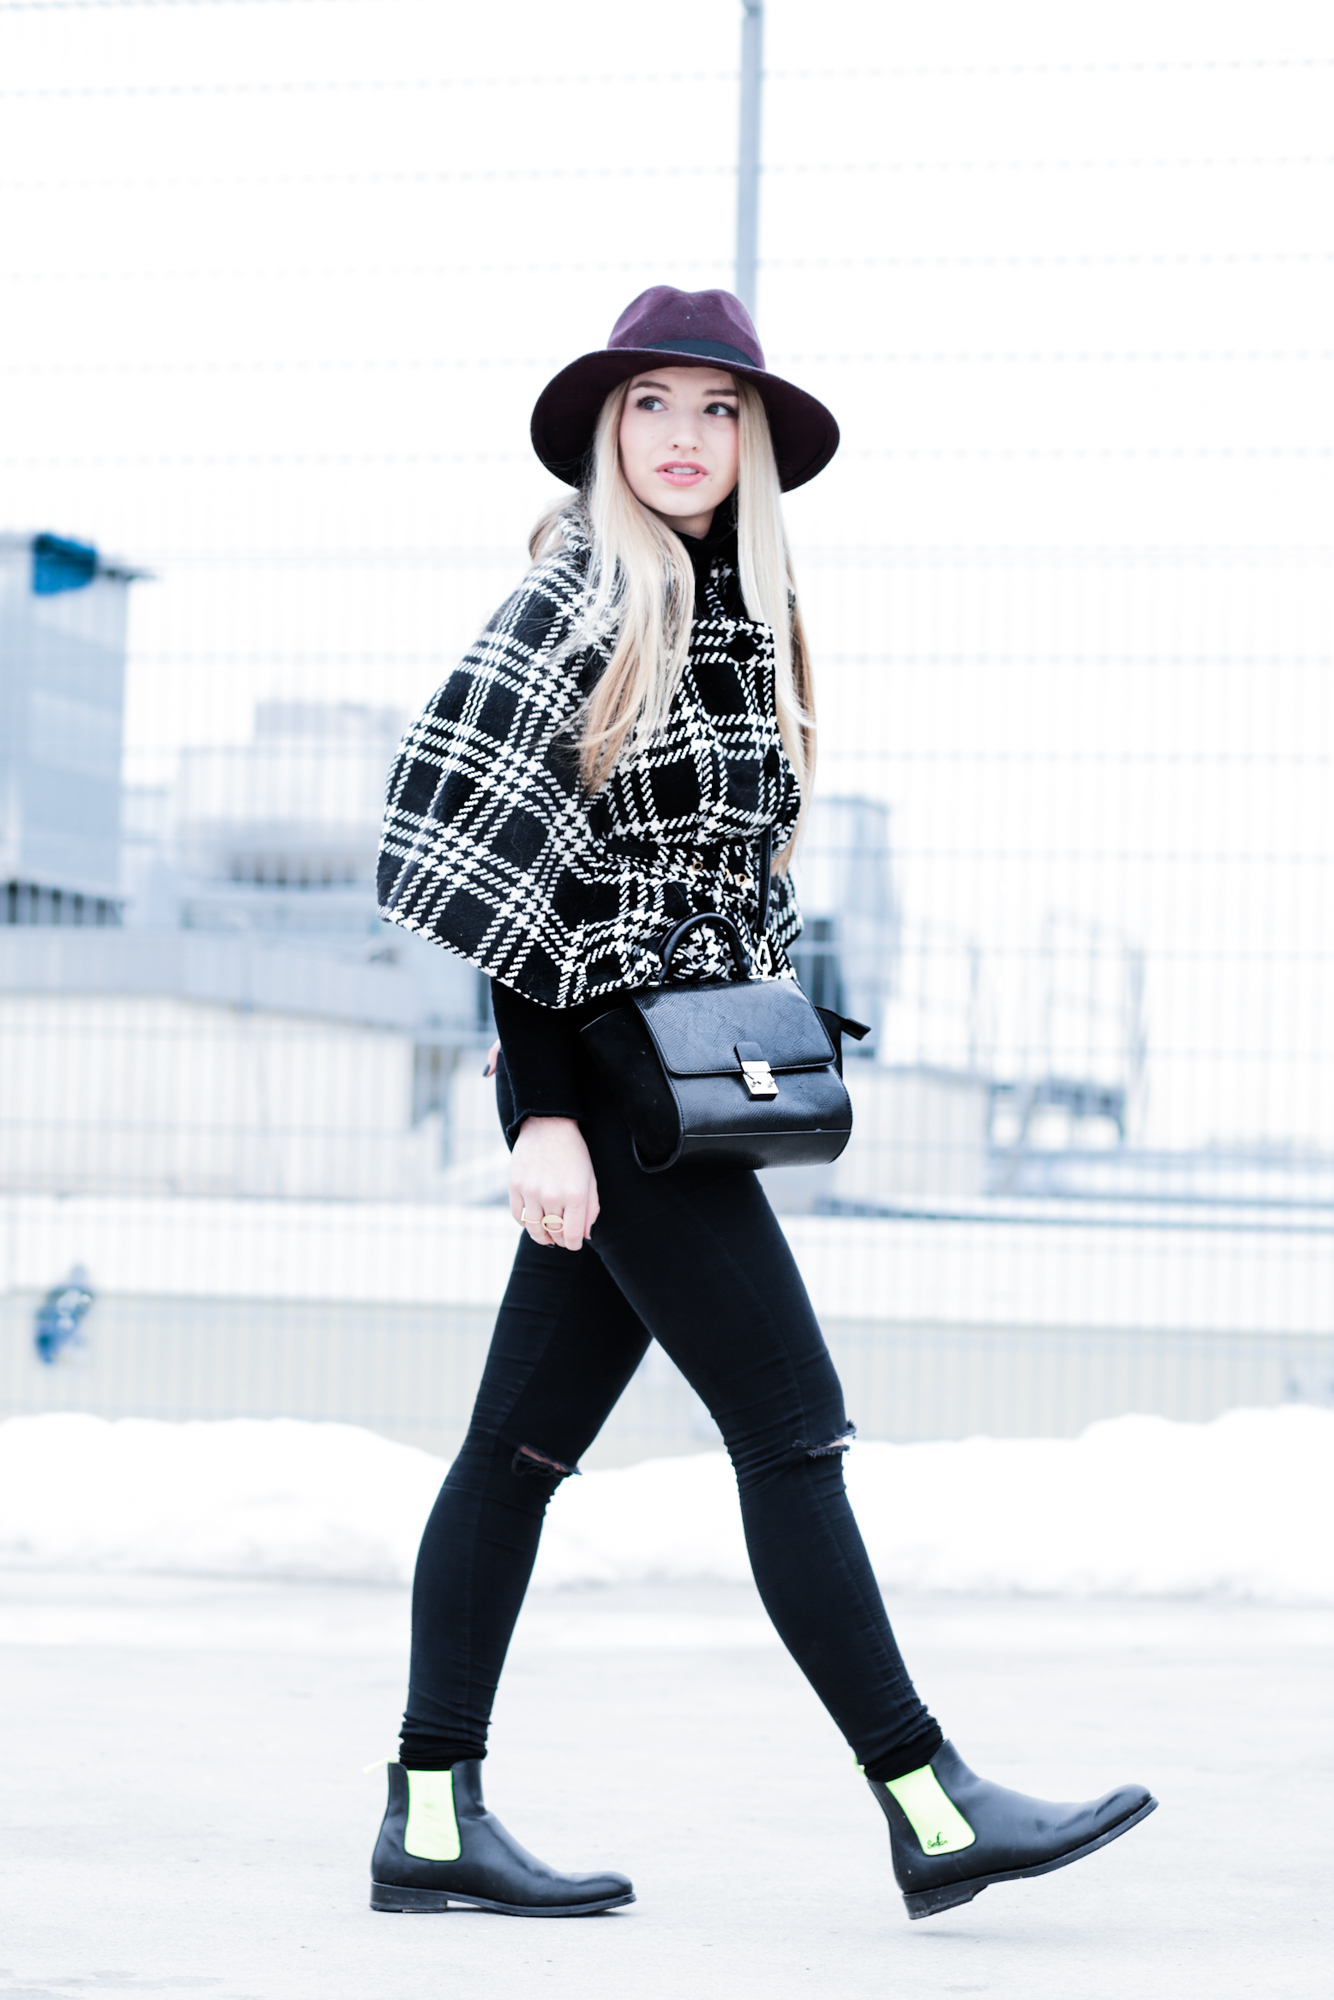 Hut Primark Serfan Chelsea Boots, Cape Poncho Fashionblog Modeblog Fashionblogger Modeblogger München Berlin Lifestyleblog Franziska Elea Instagram